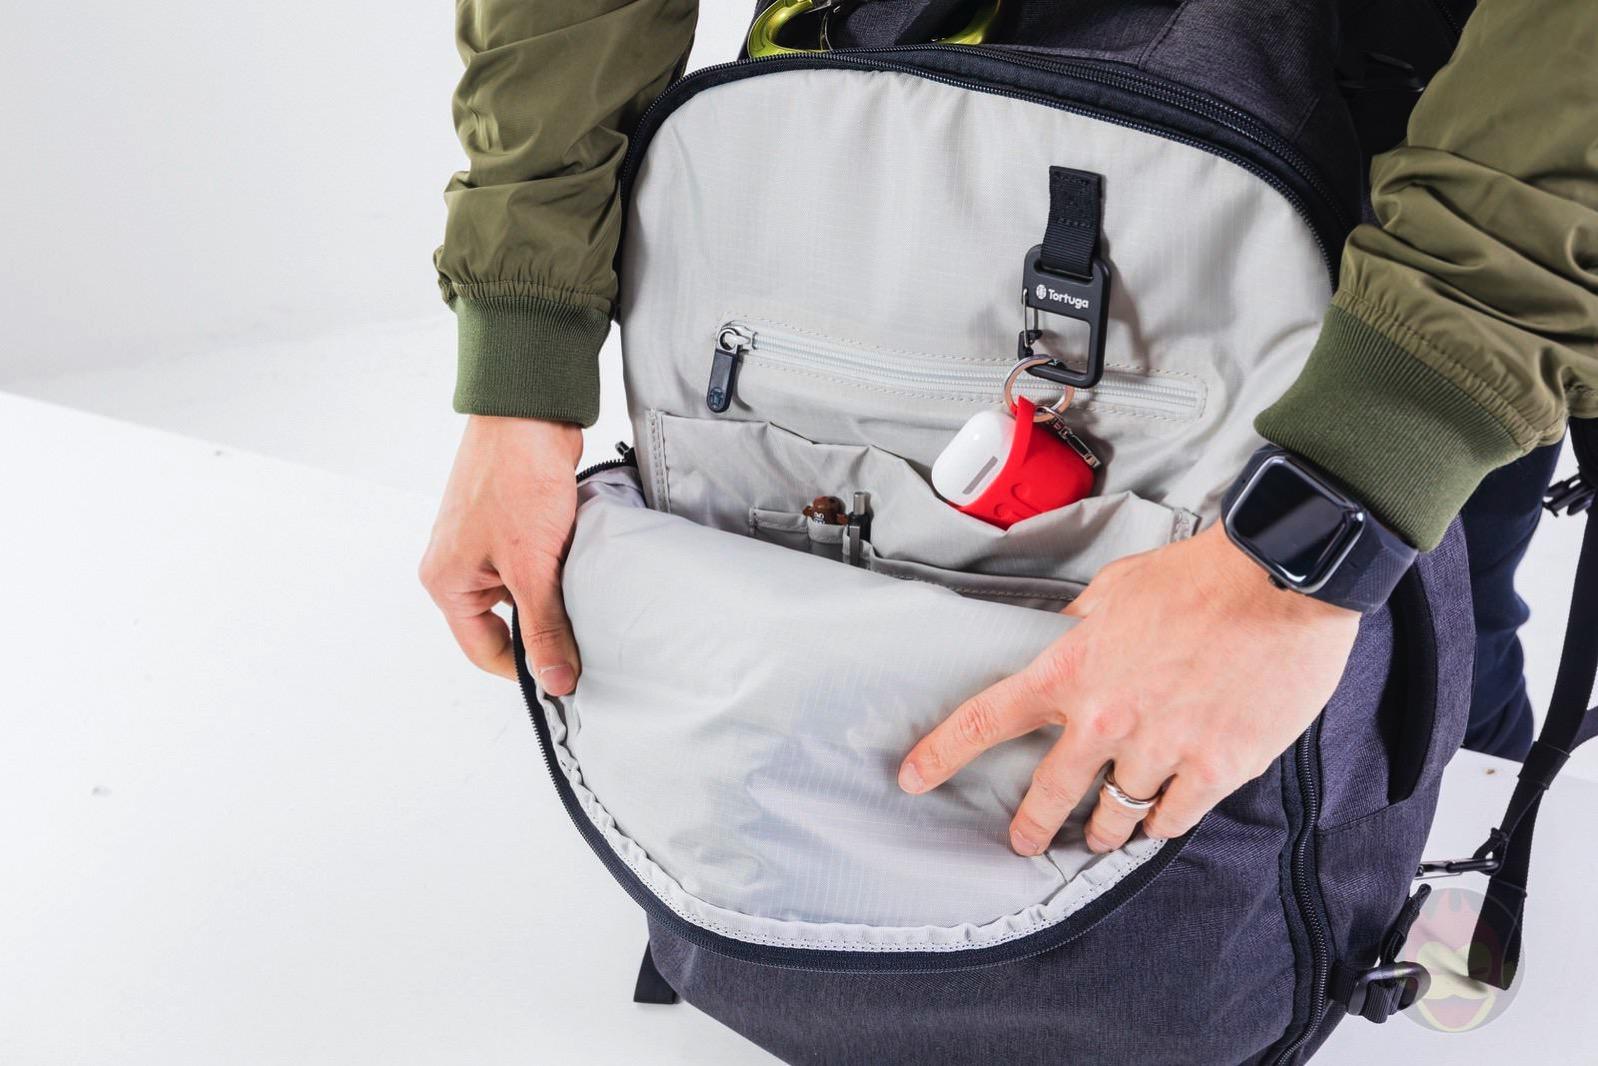 Tortuga-Setout-Backpack-35liter-review-16.jpg